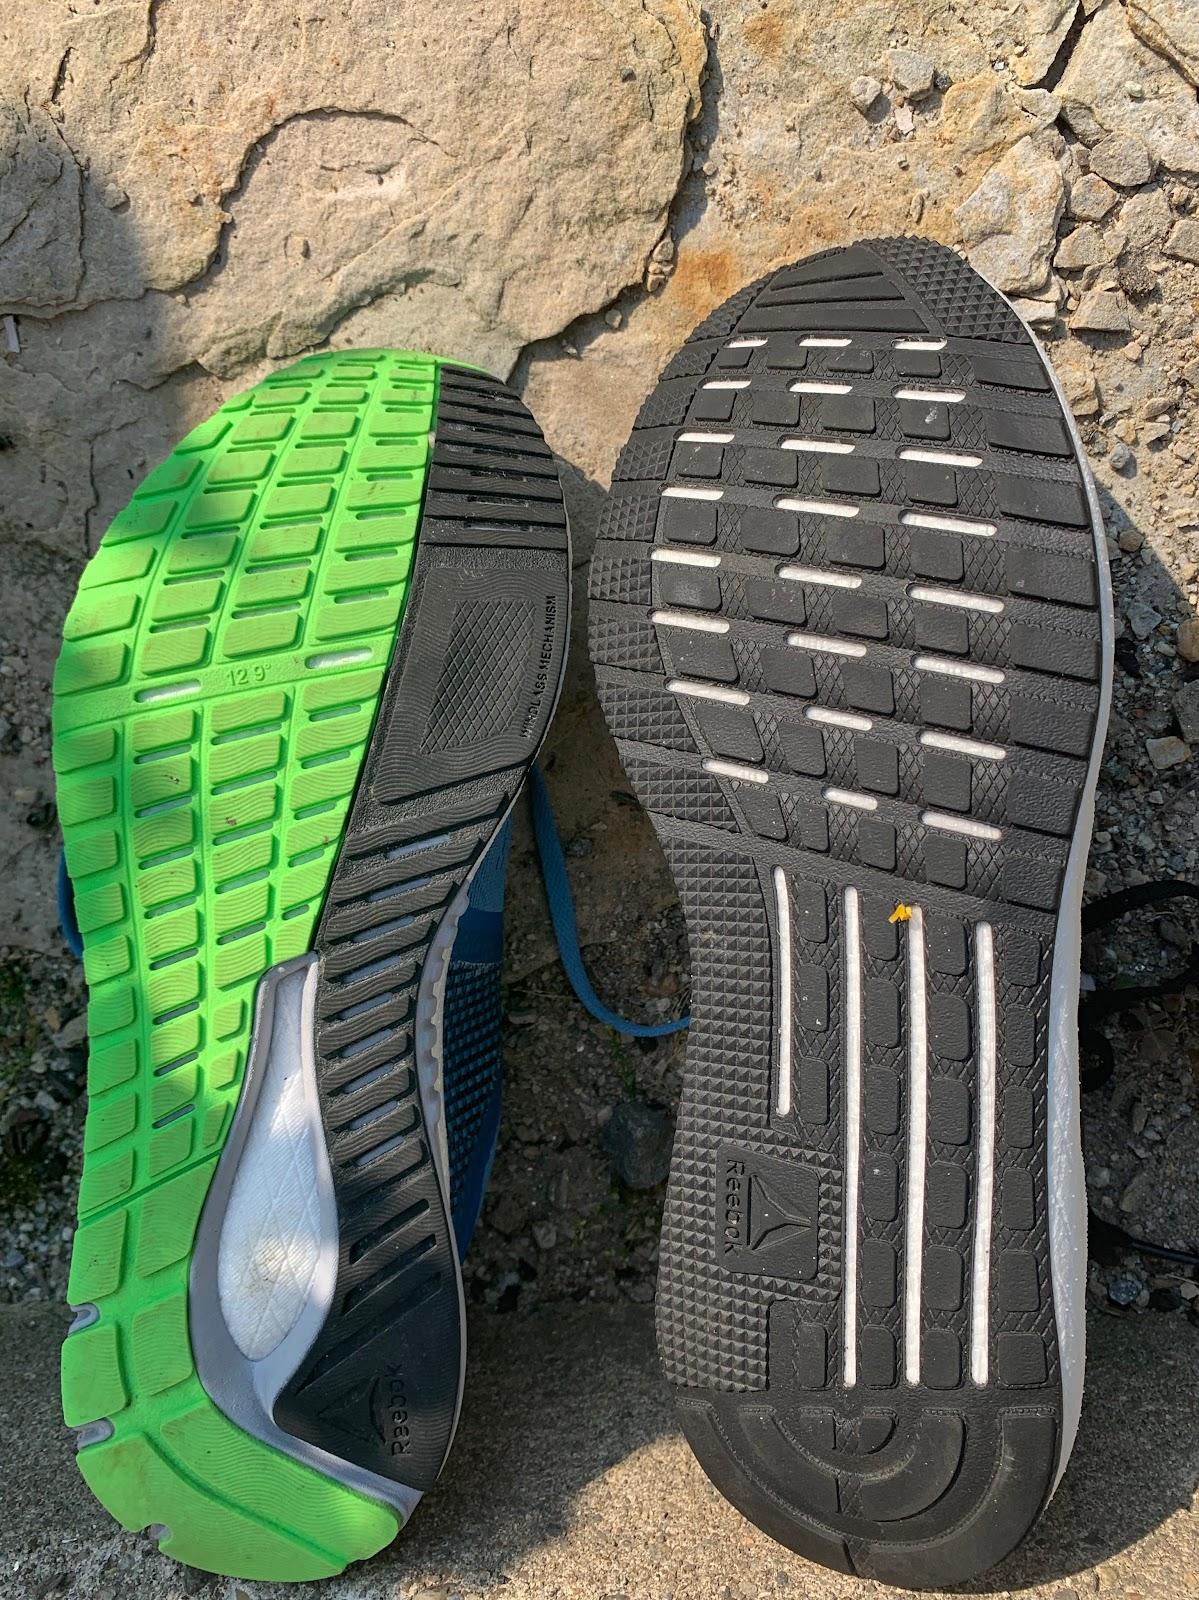 3f75c6b0ec Road Trail Run: Reebok Harmony Road 3 Multi Tester Review